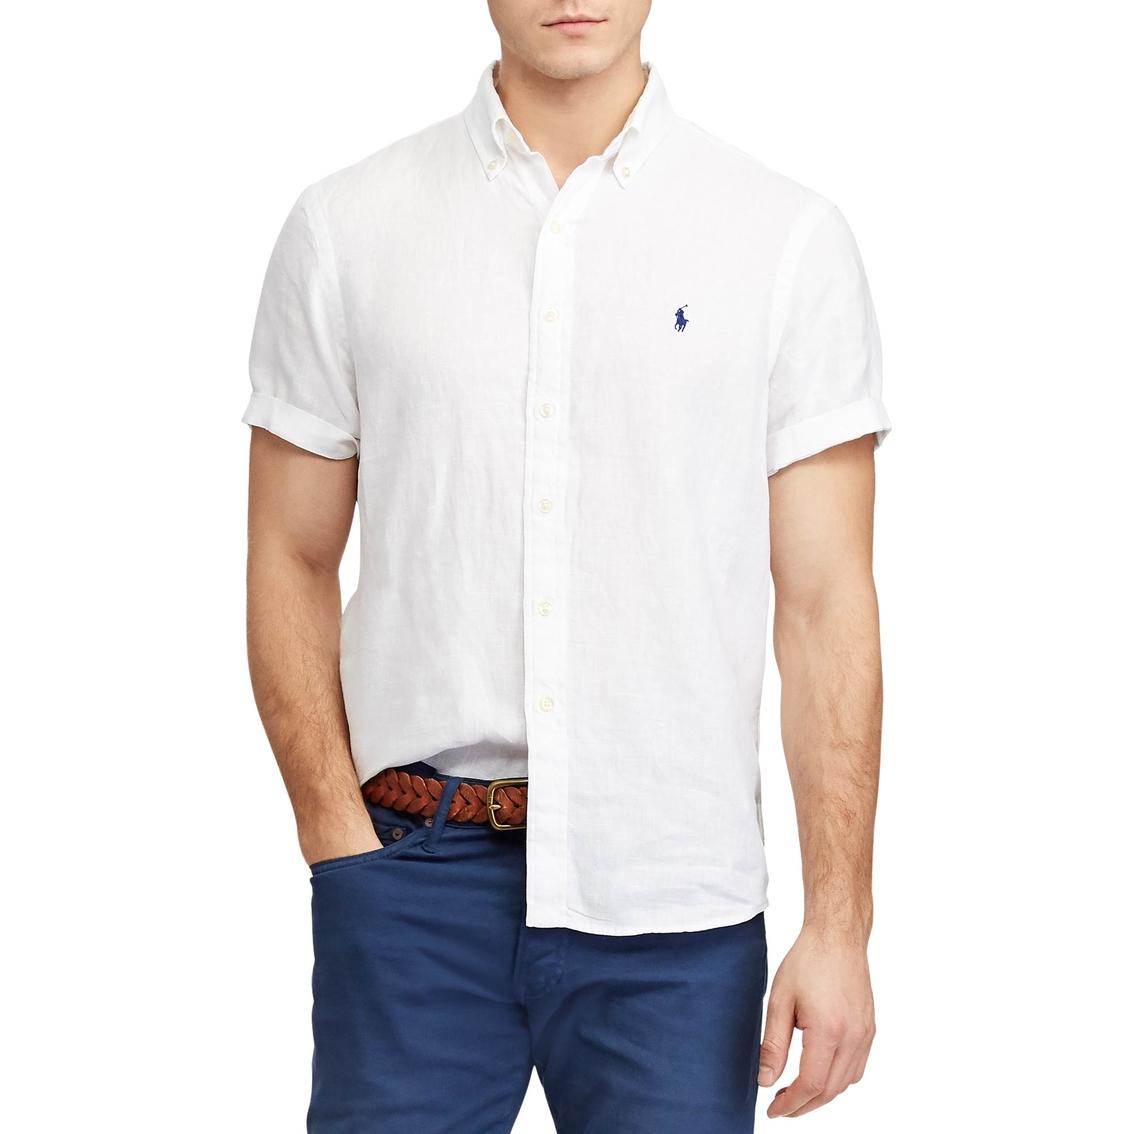 6d5dd188 Polo Ralph Lauren Classic Fit Plaid Linen Shirt | Casual | Apparel ...